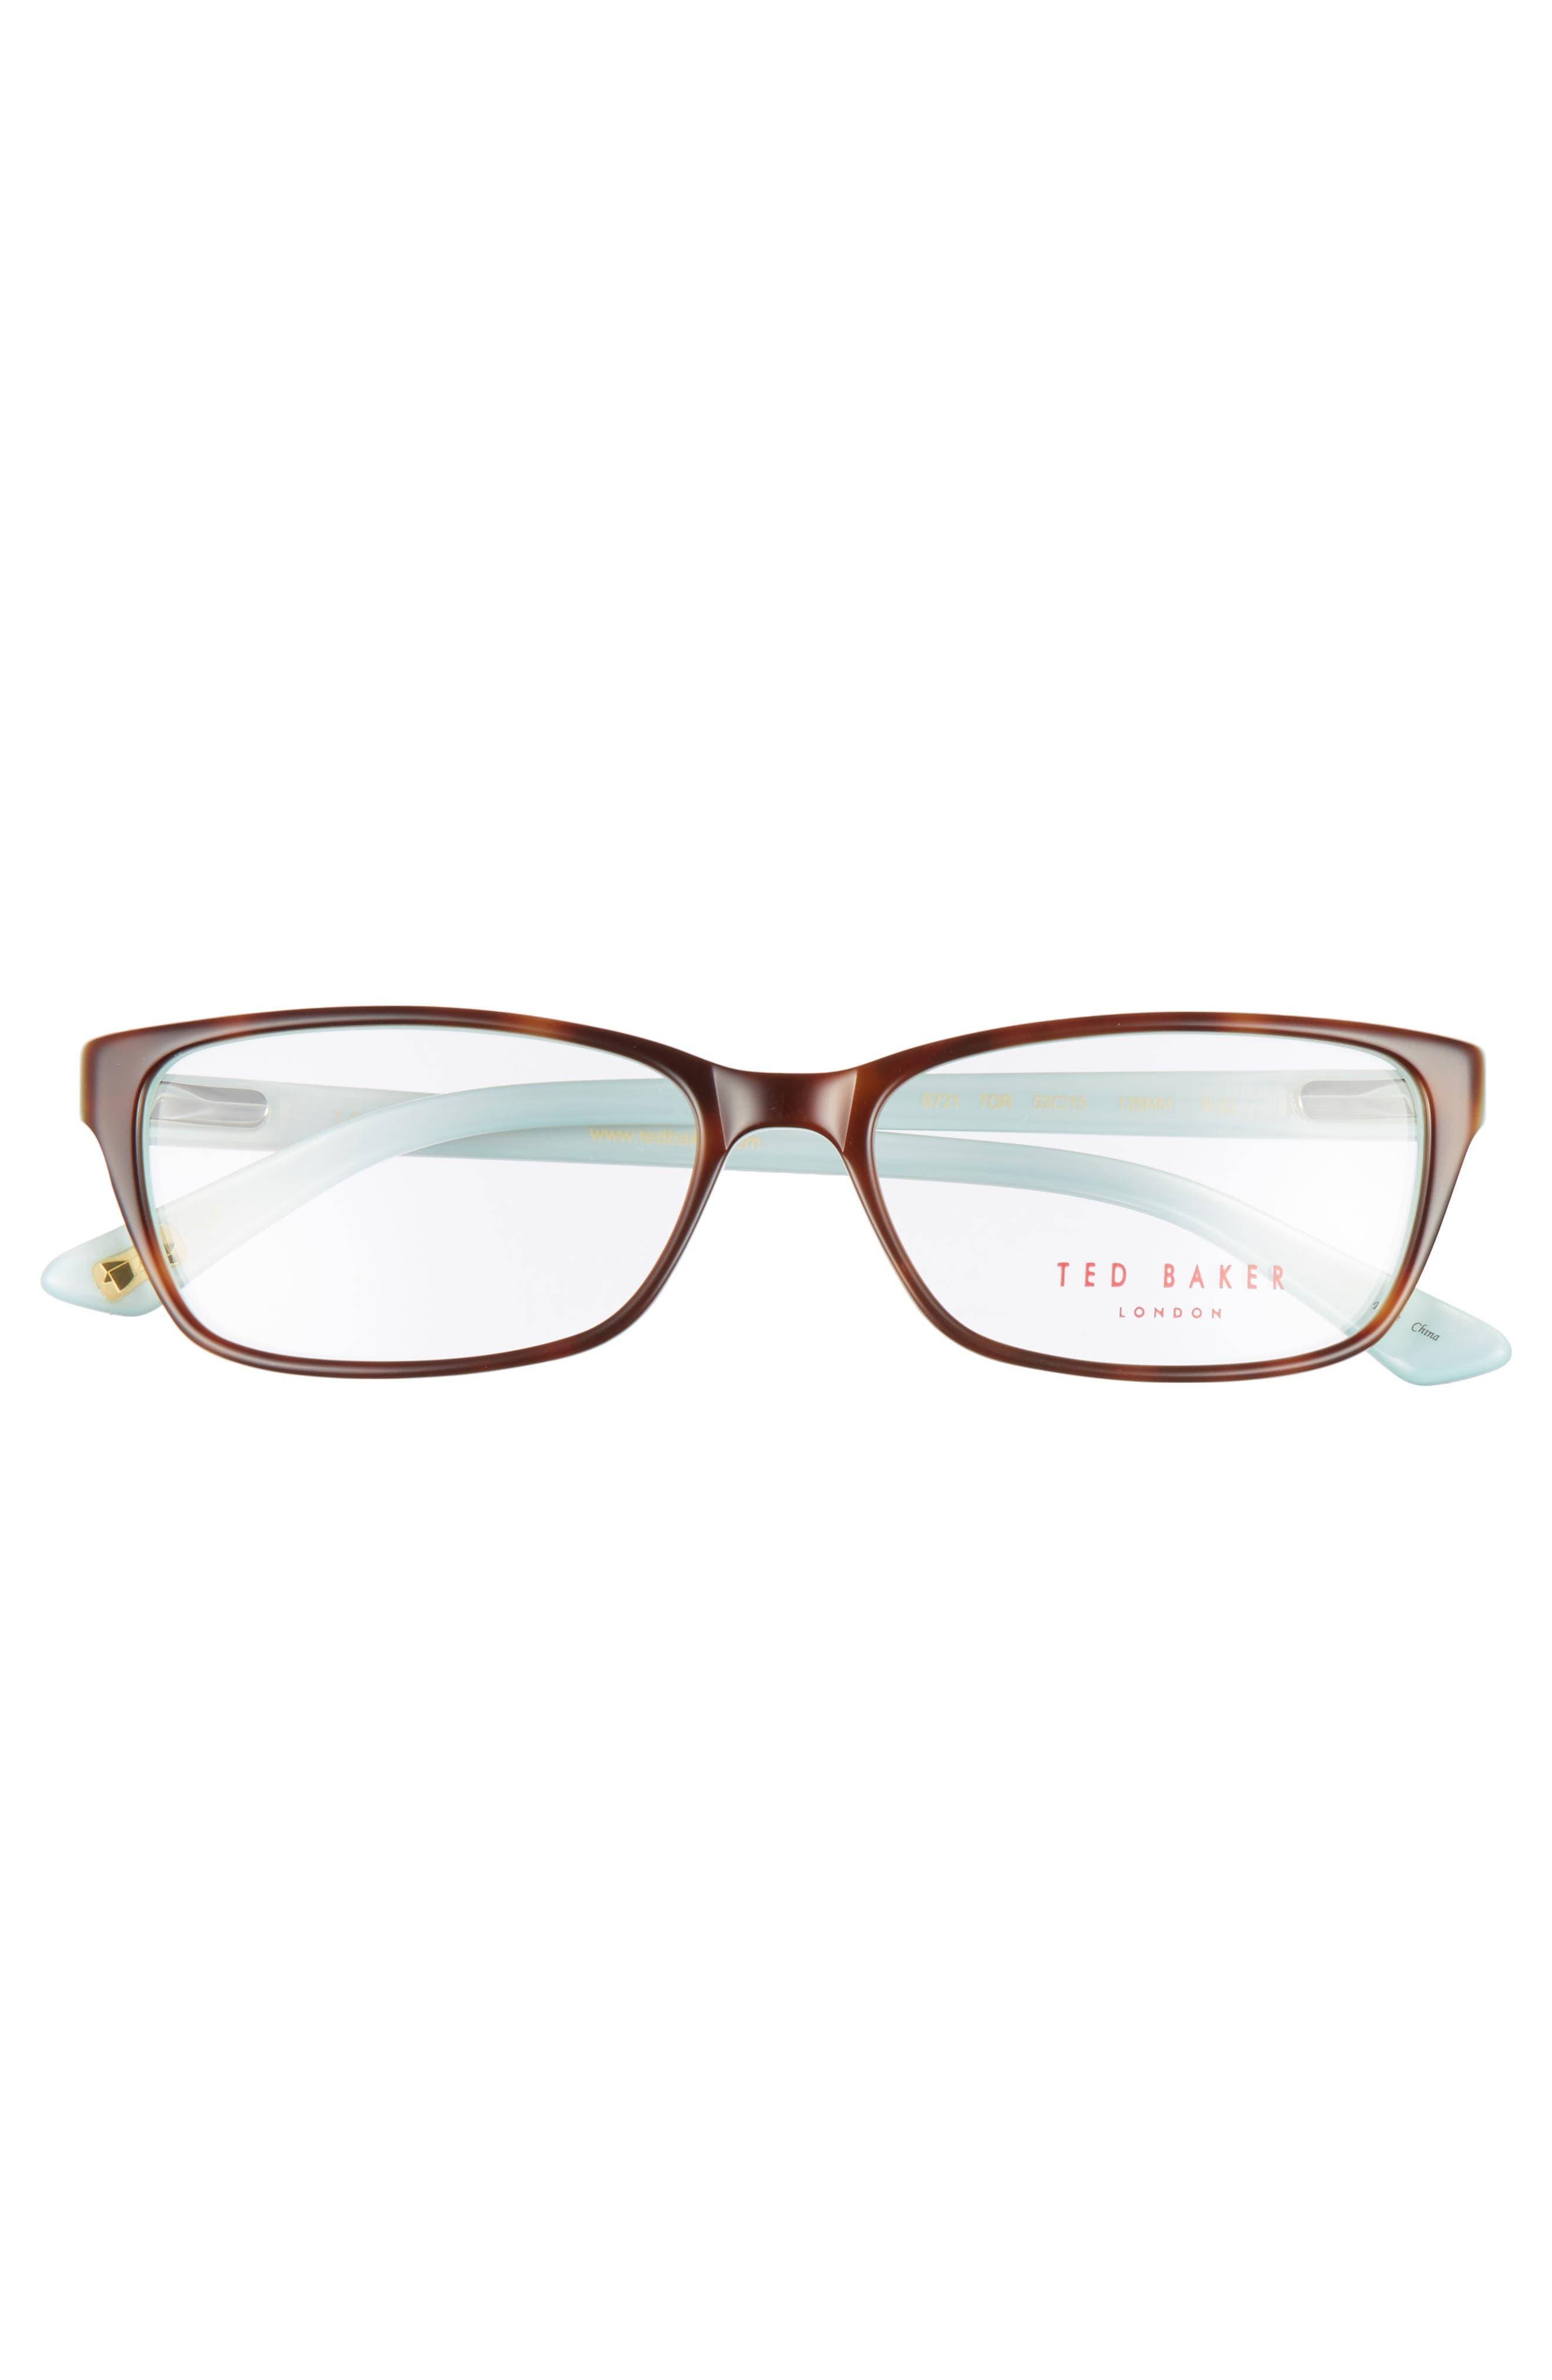 53mm Optical Glasses,                             Alternate thumbnail 3, color,                             Brown